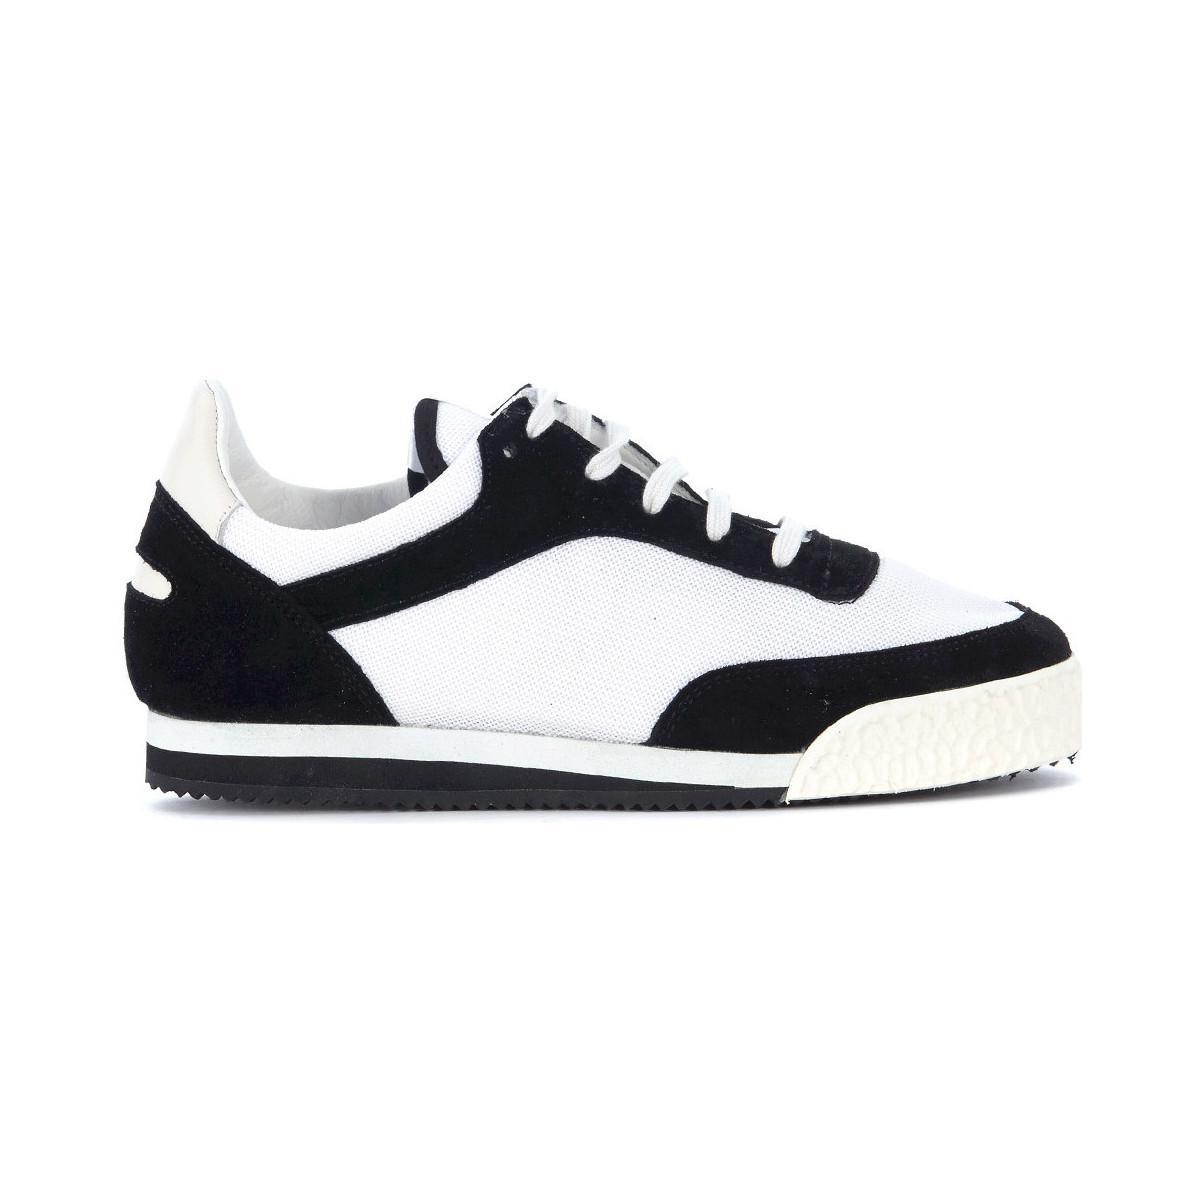 00601b35b31 Comme des Garçons X Spalwart Pitch Black And White Men s Shoes ...